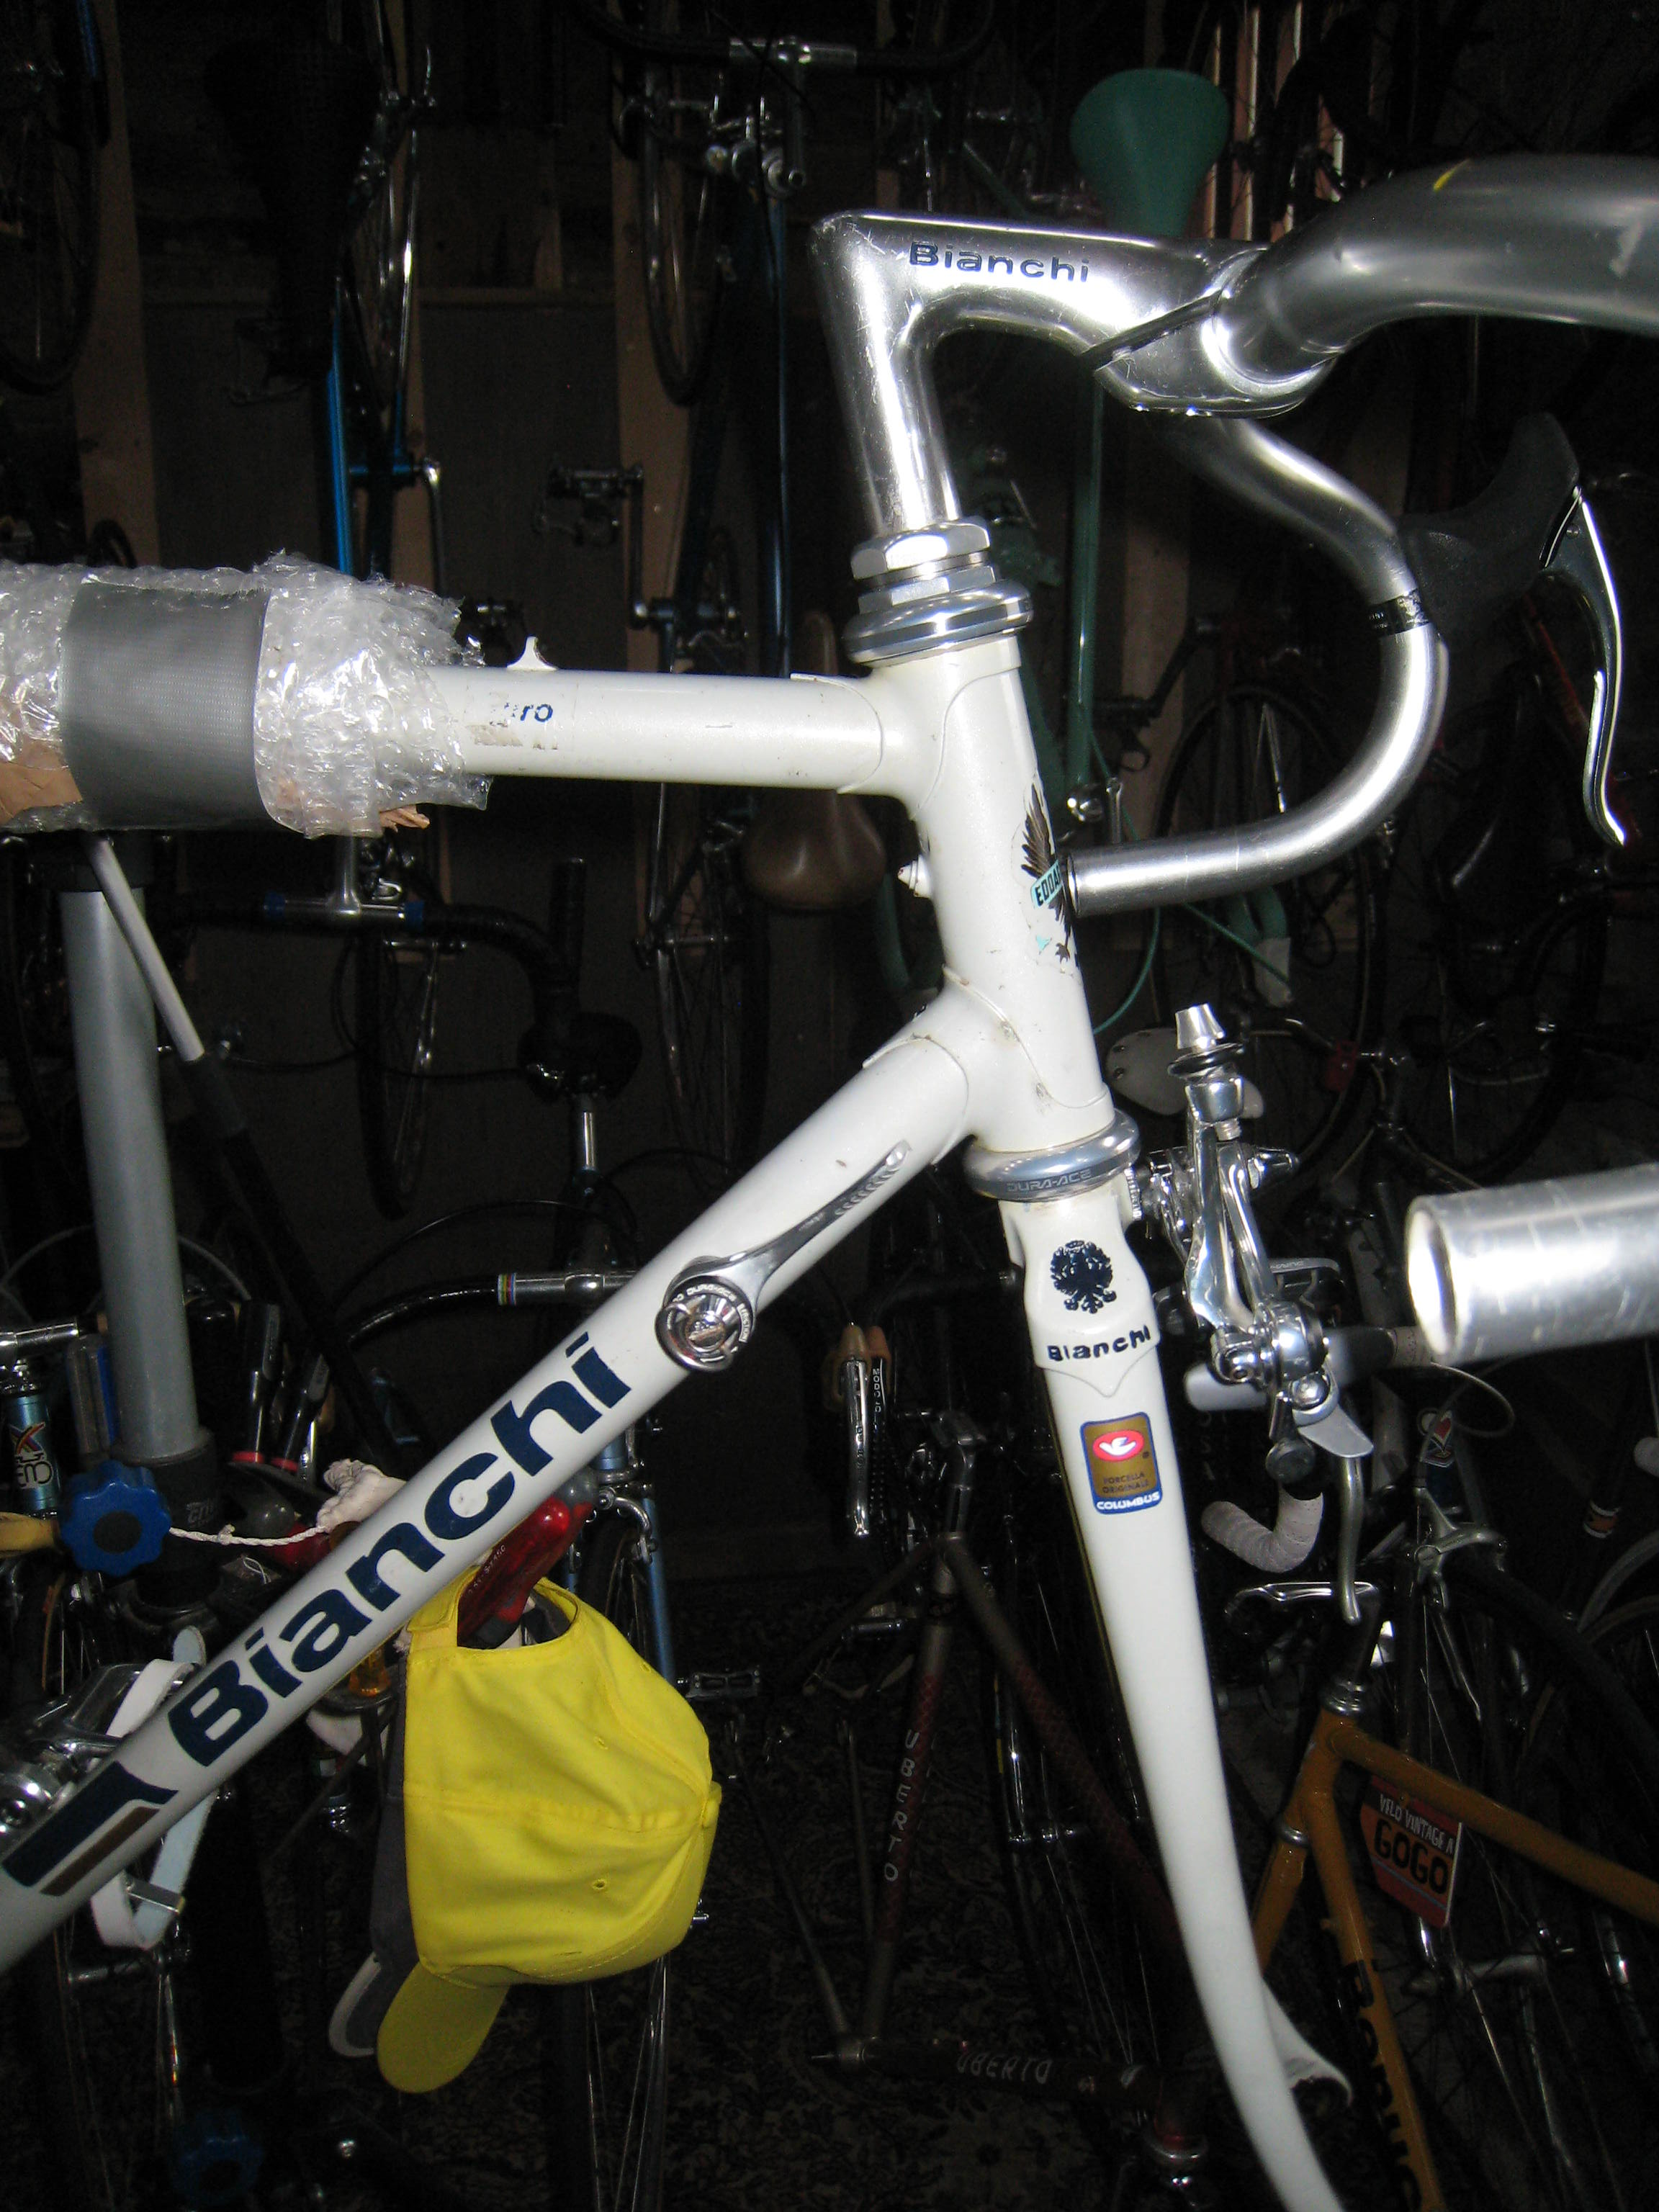 Bianchi specialissima GIRO 50956124386_f8e21b6a9a_3k